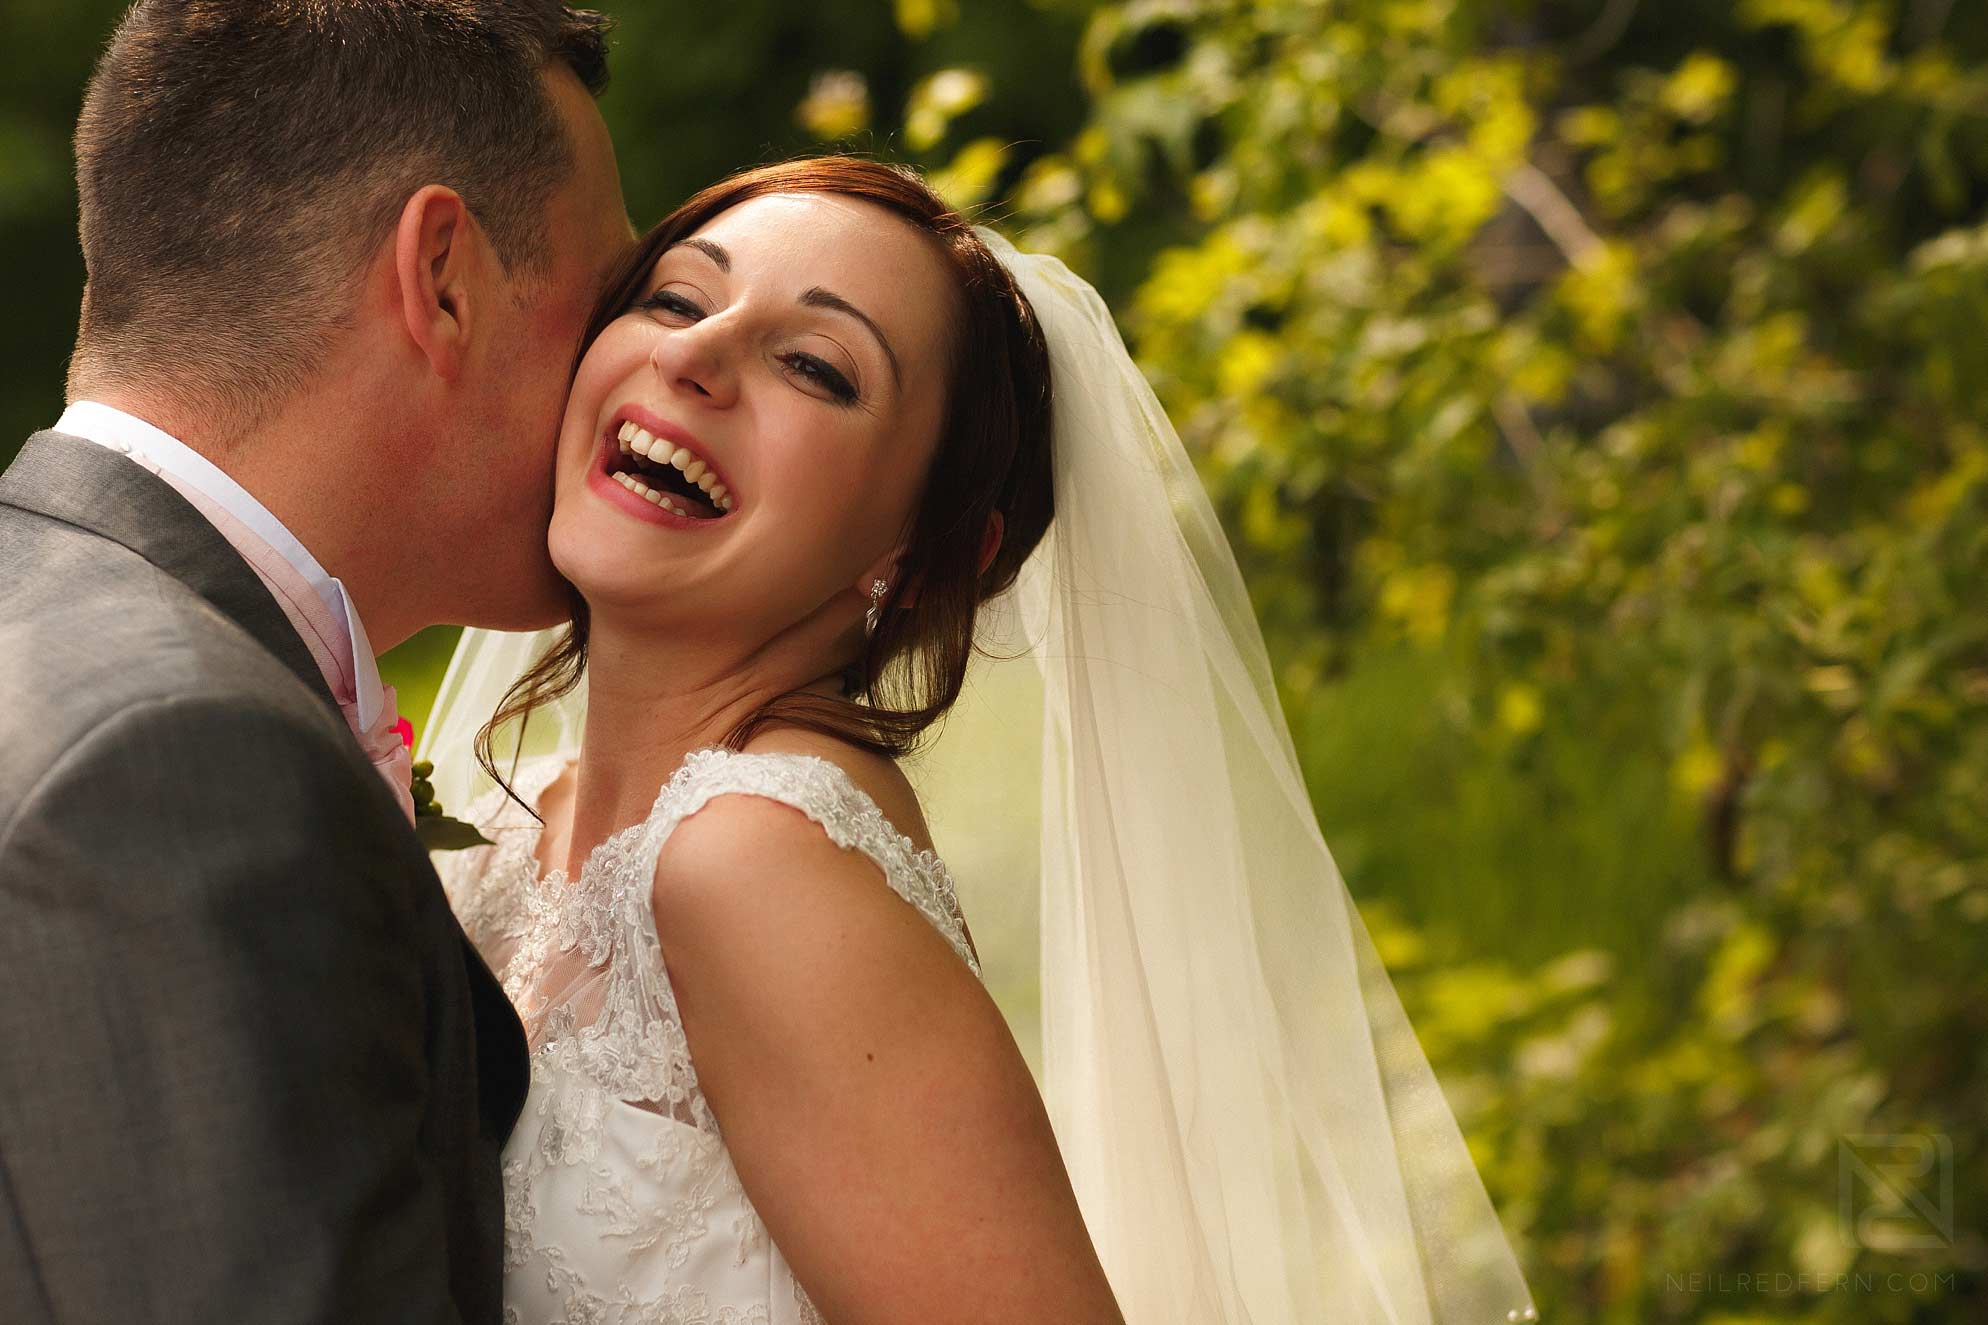 Metropole-Hotel-Llandrindod-Wells-wedding-24